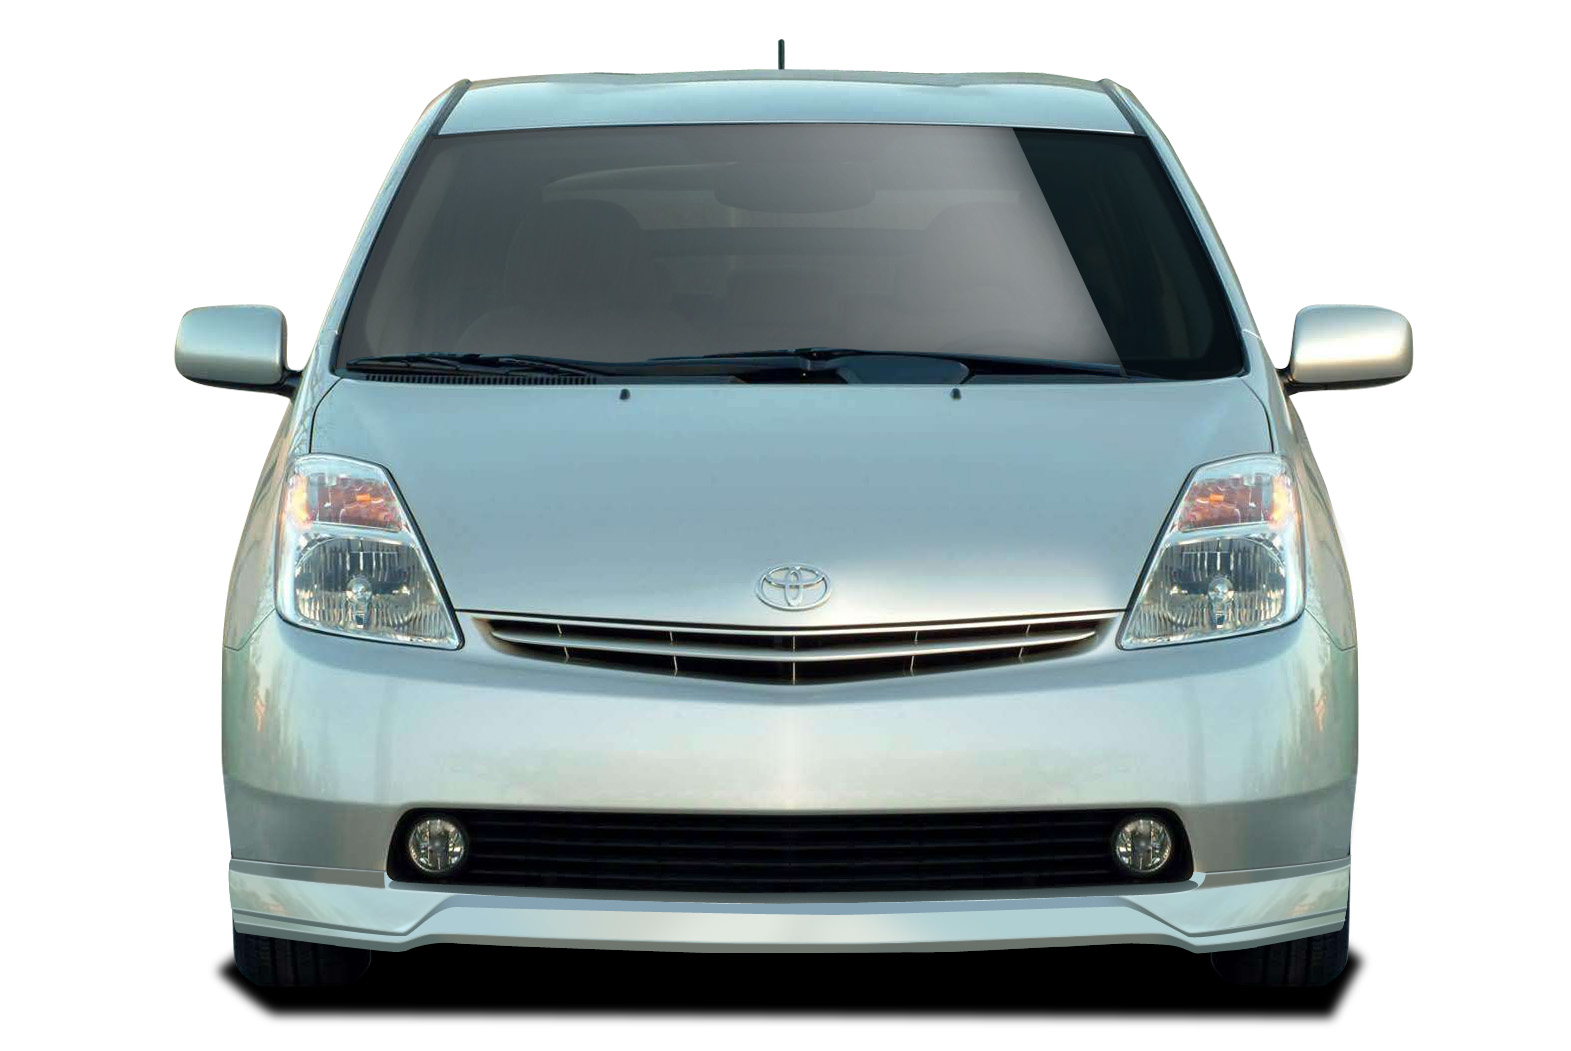 Polyurethane Front Lip/Add On Bodykit for 2004 Toyota Prius ALL - 2004-2009 Toyota Prius Couture Vortex Front Lip Under Spoiler Air Dam - 1 Piece